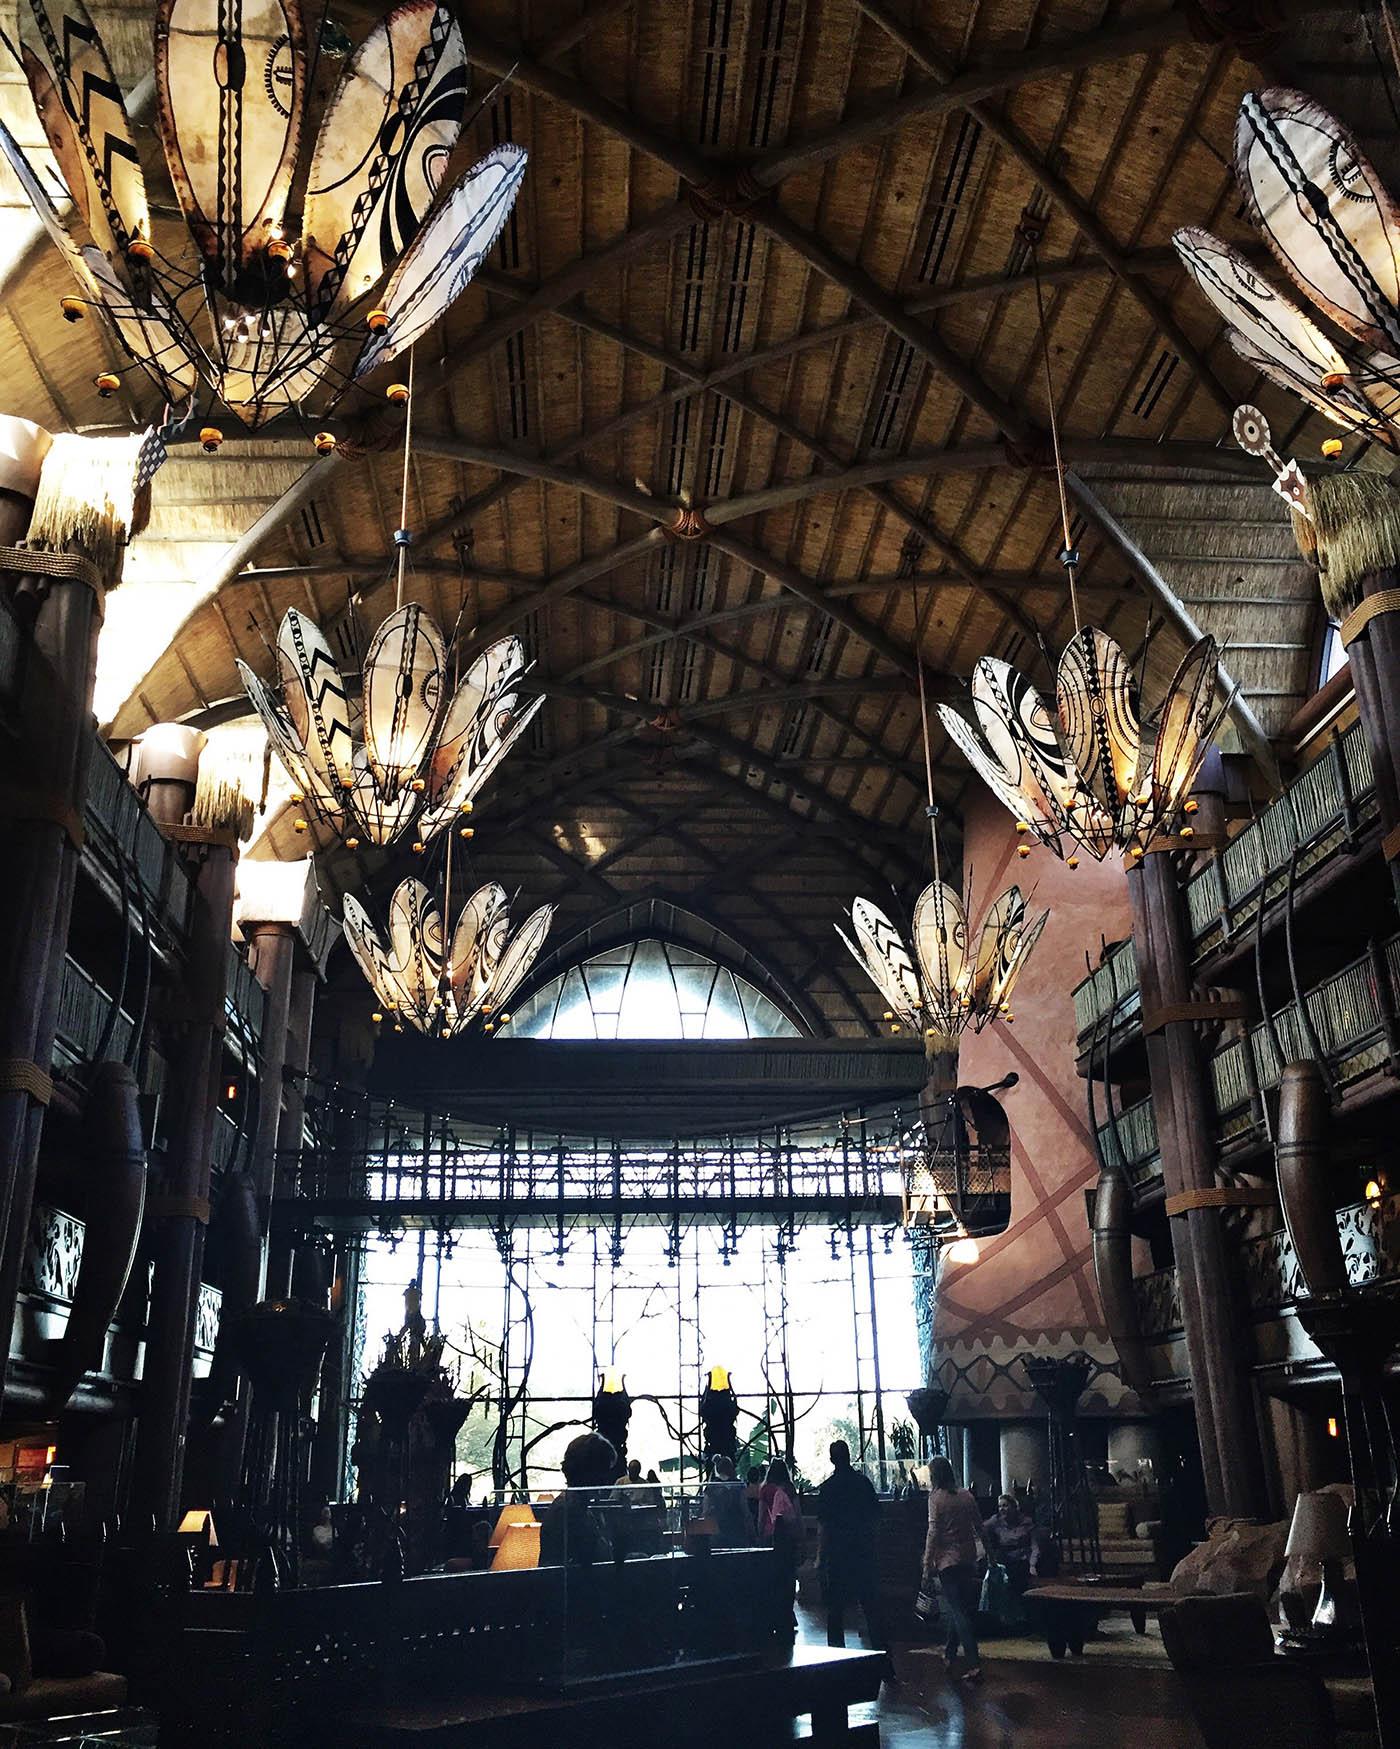 10 reasons to stay at Disney's Animal Kingdom Lodge